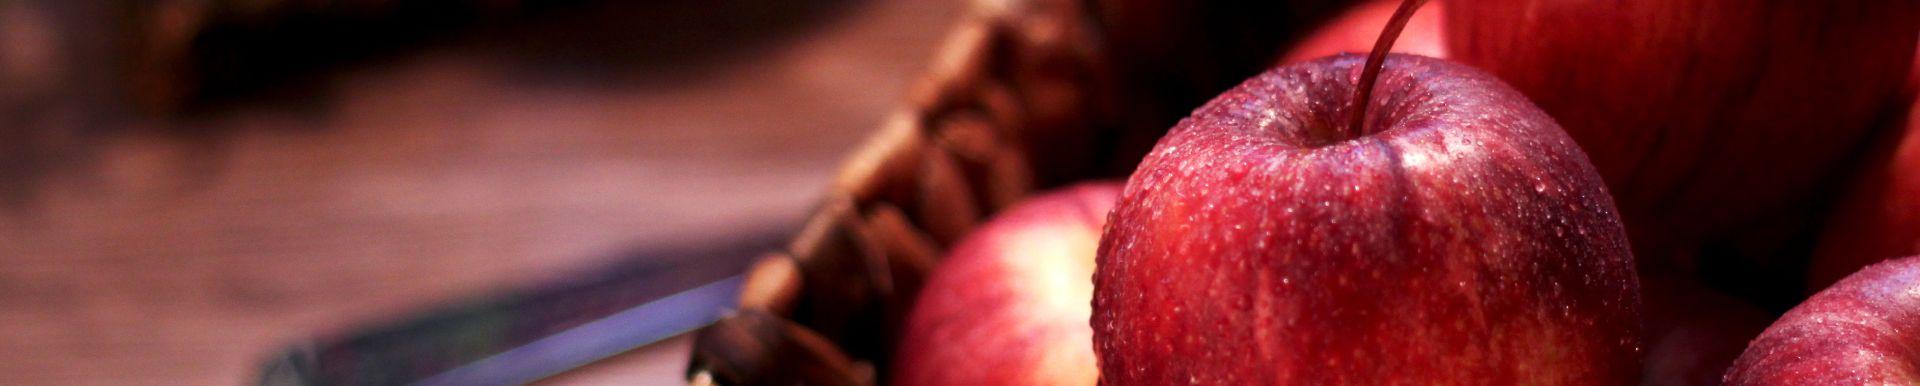 SUN-SAD dostępność owoców banner